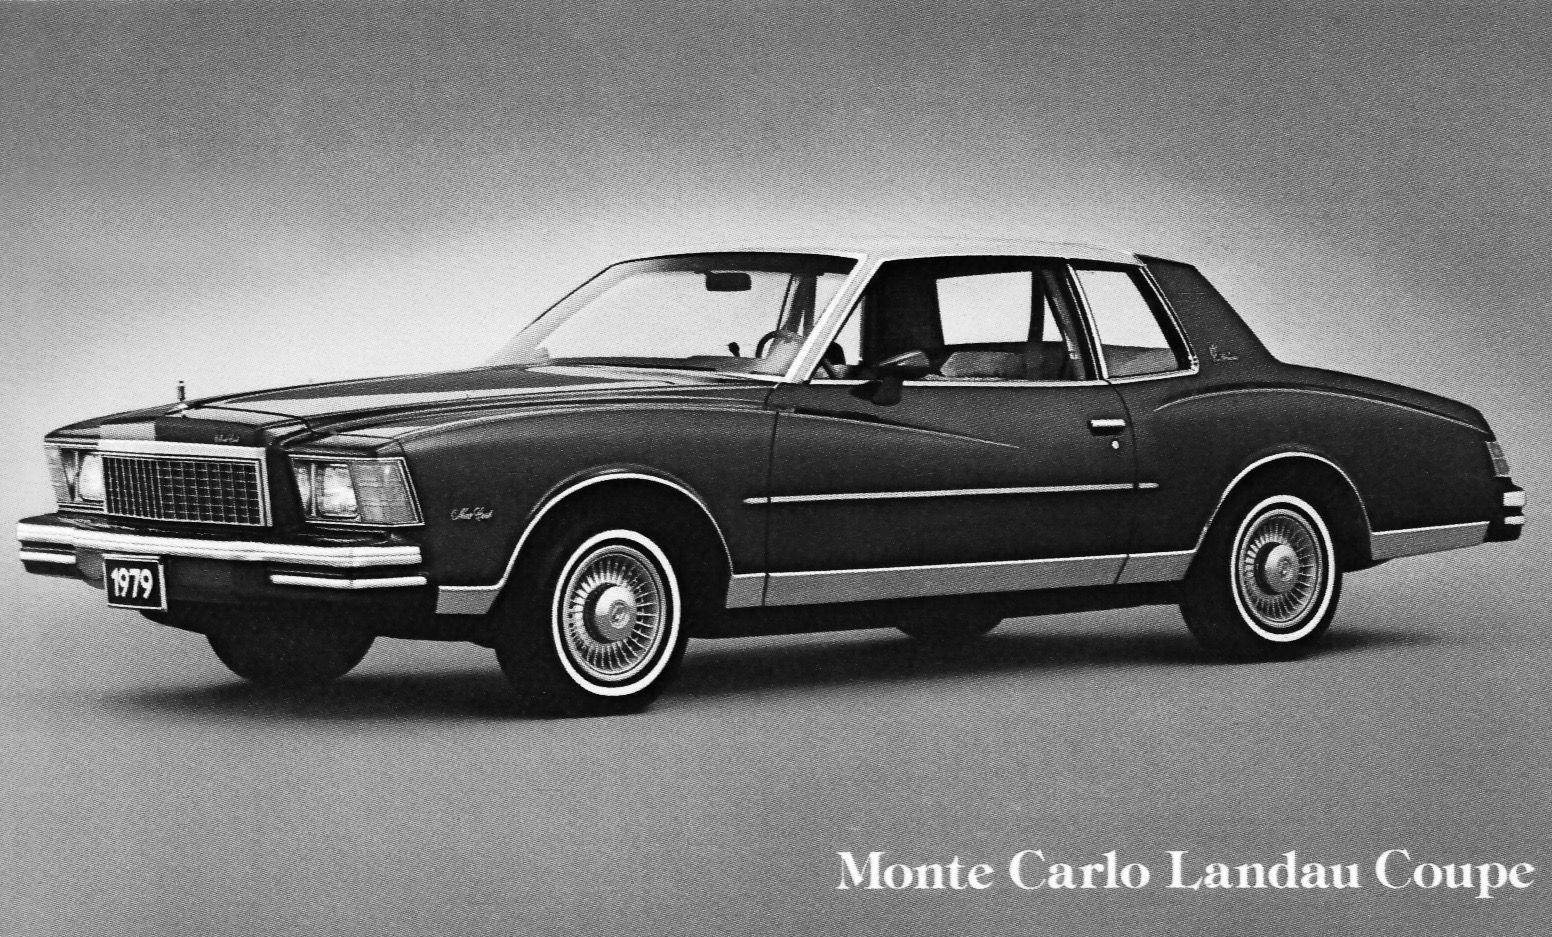 1979 Monte Carlo Landau Coupe Chevrolet Monte Carlo Chevrolet